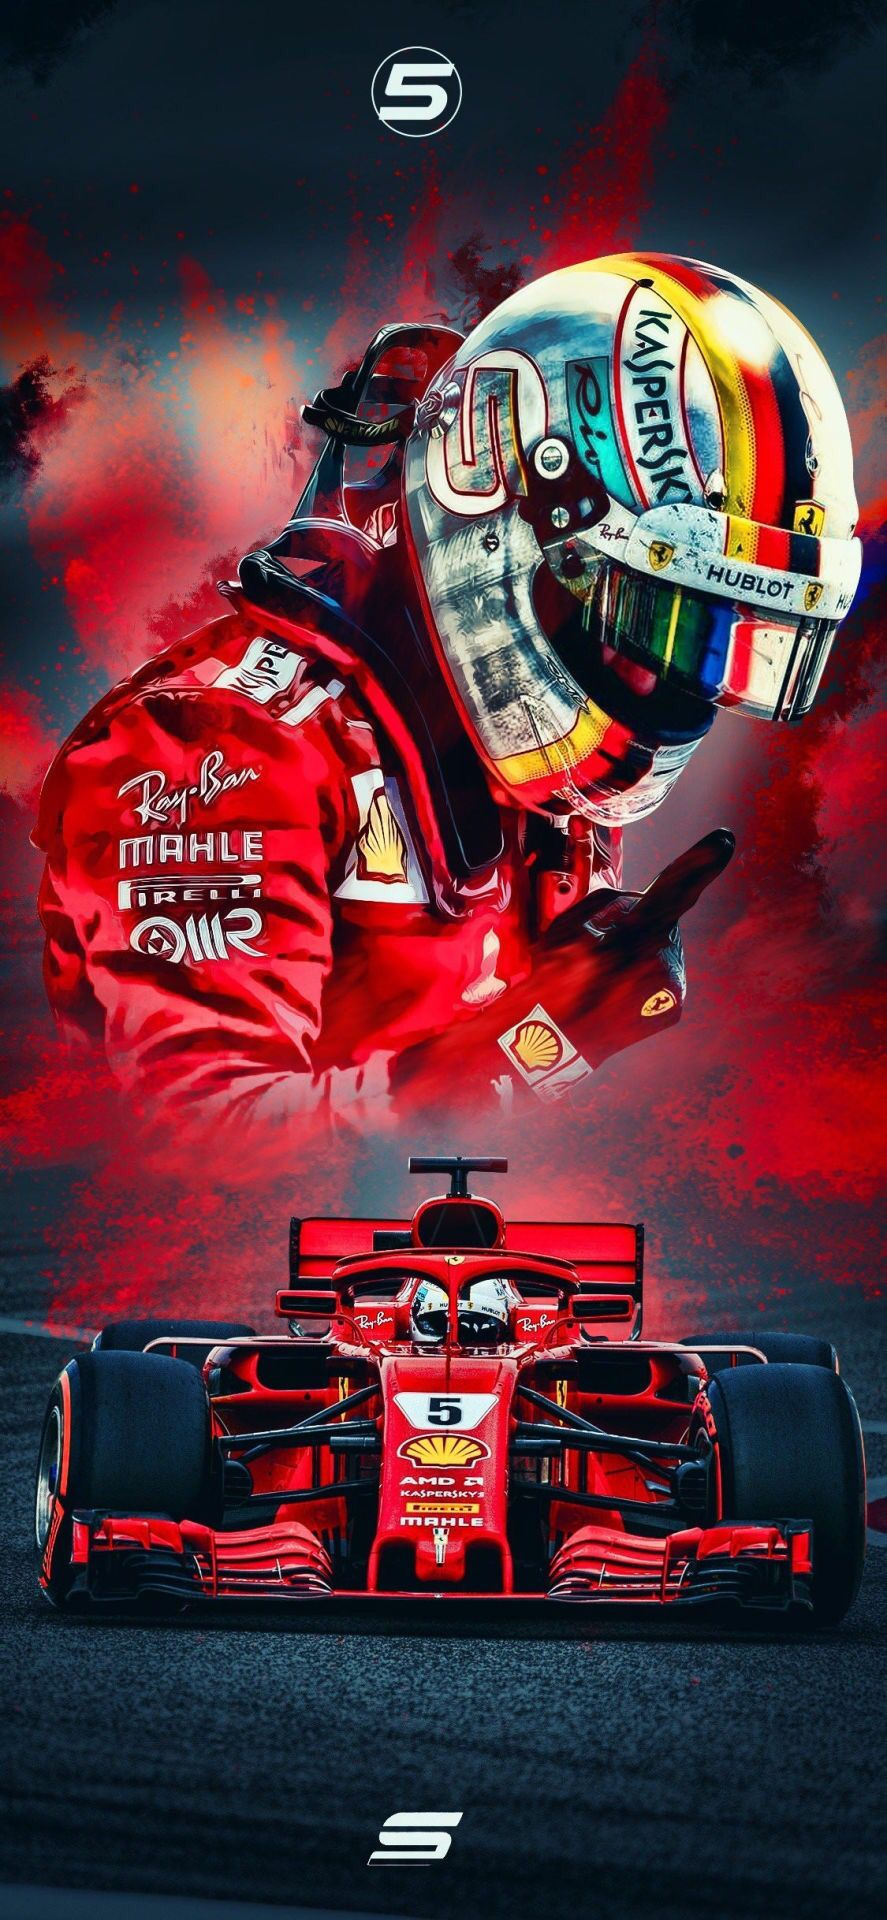 Vettel Wallpapers Top Free Vettel Backgrounds Wallpaperaccess